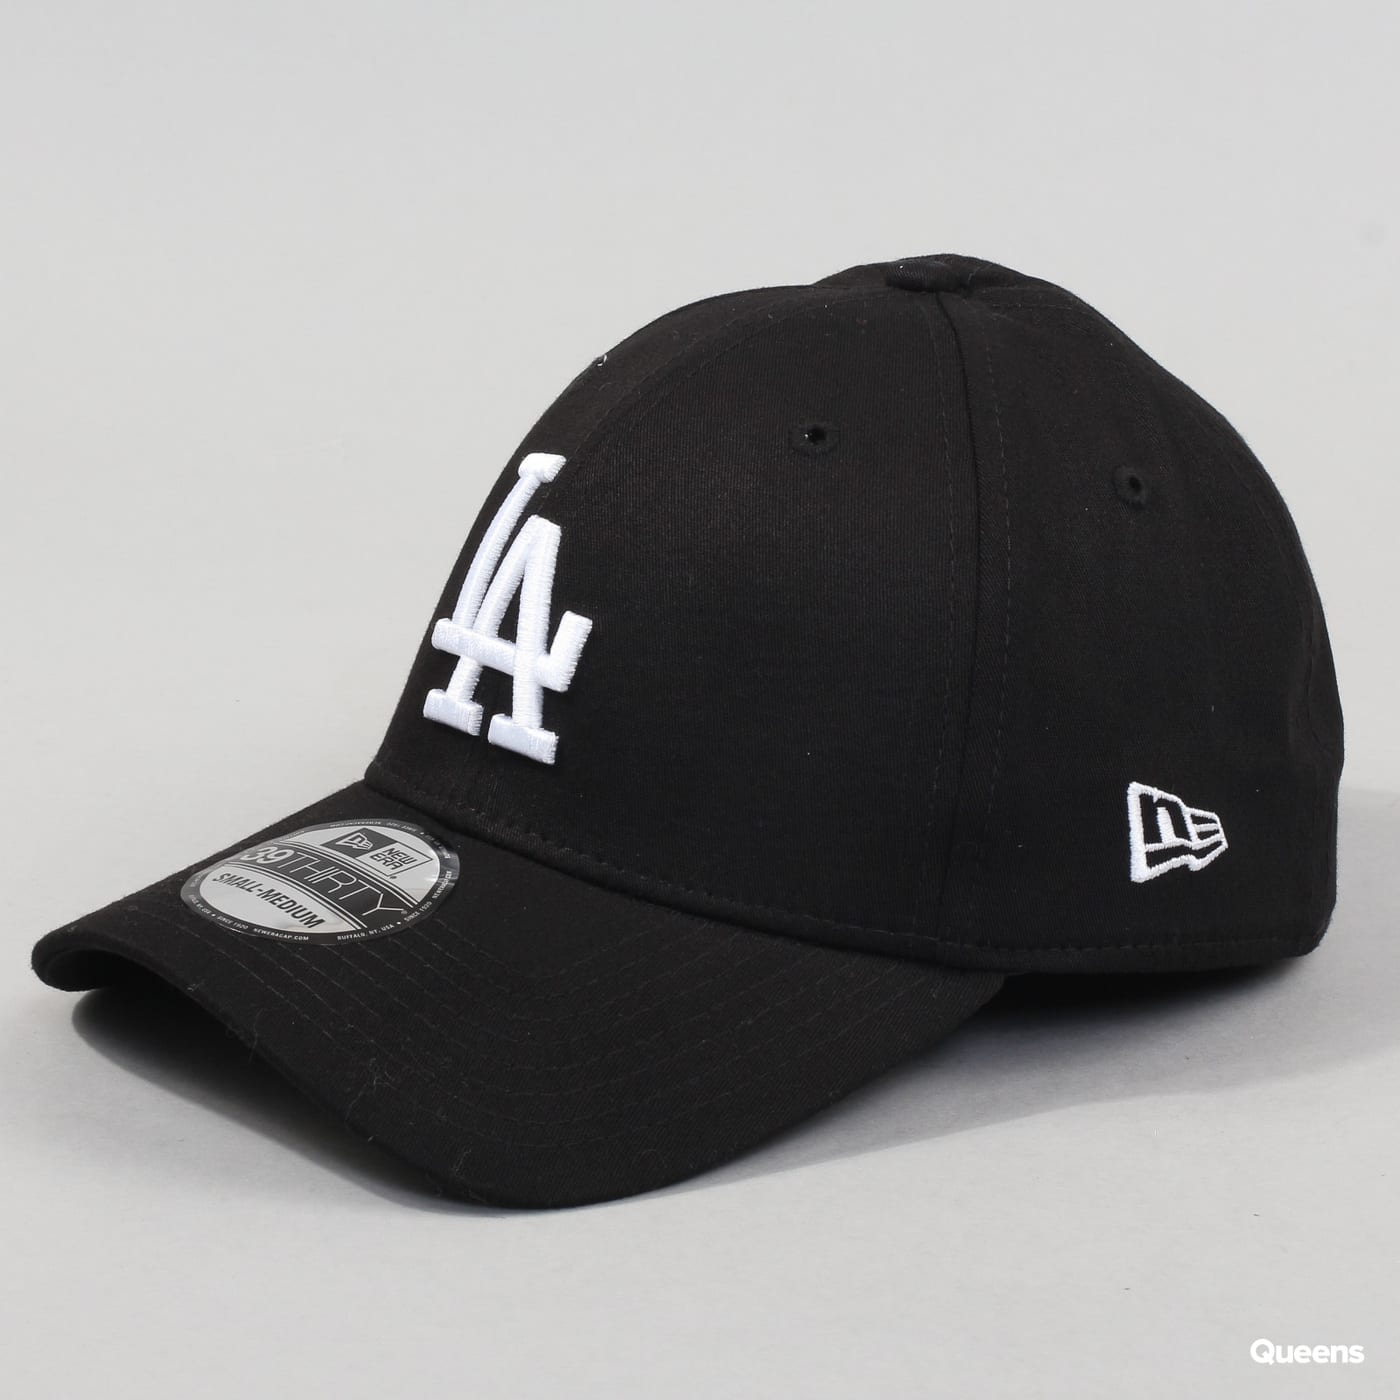 New Era 3930 MLB League Essential LA black / white